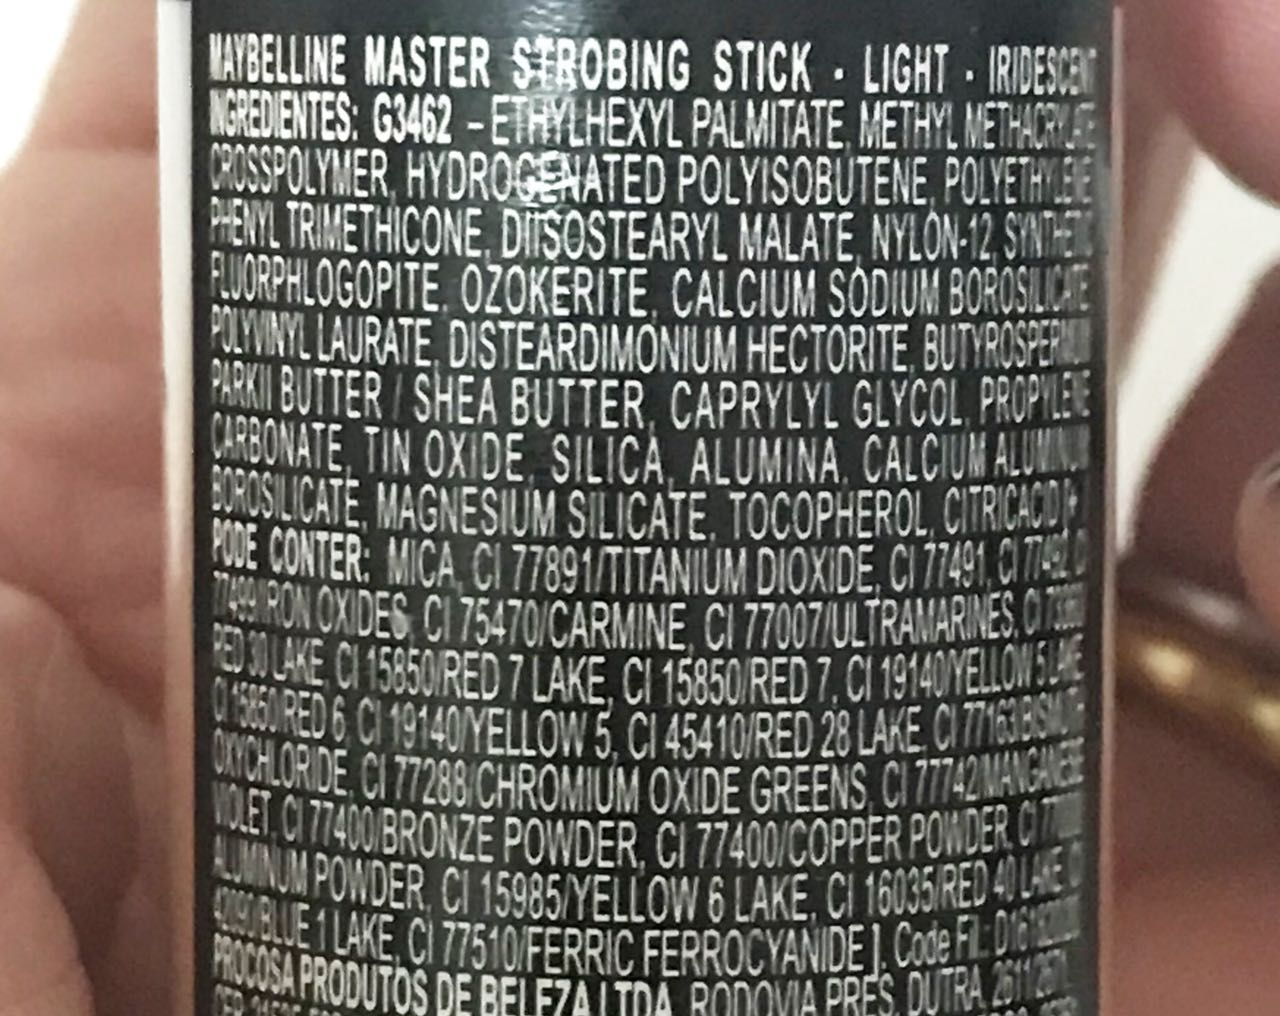 Resenha do iluminador Master Strobing Stick da Maybelline